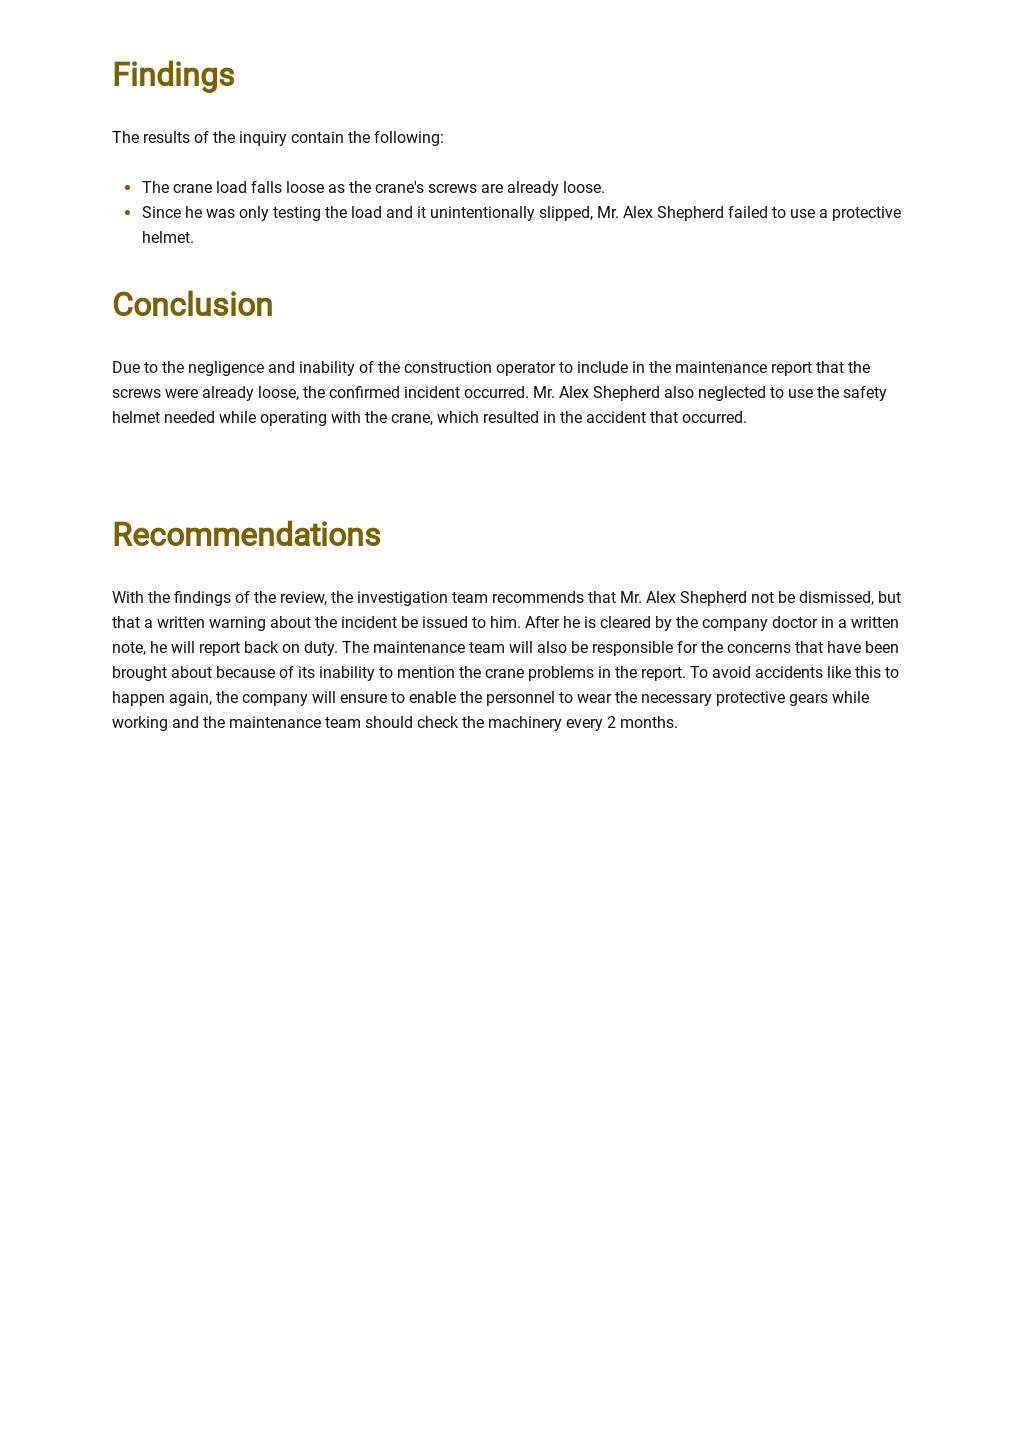 Construction Incident Investigation Report Template 3.jpe